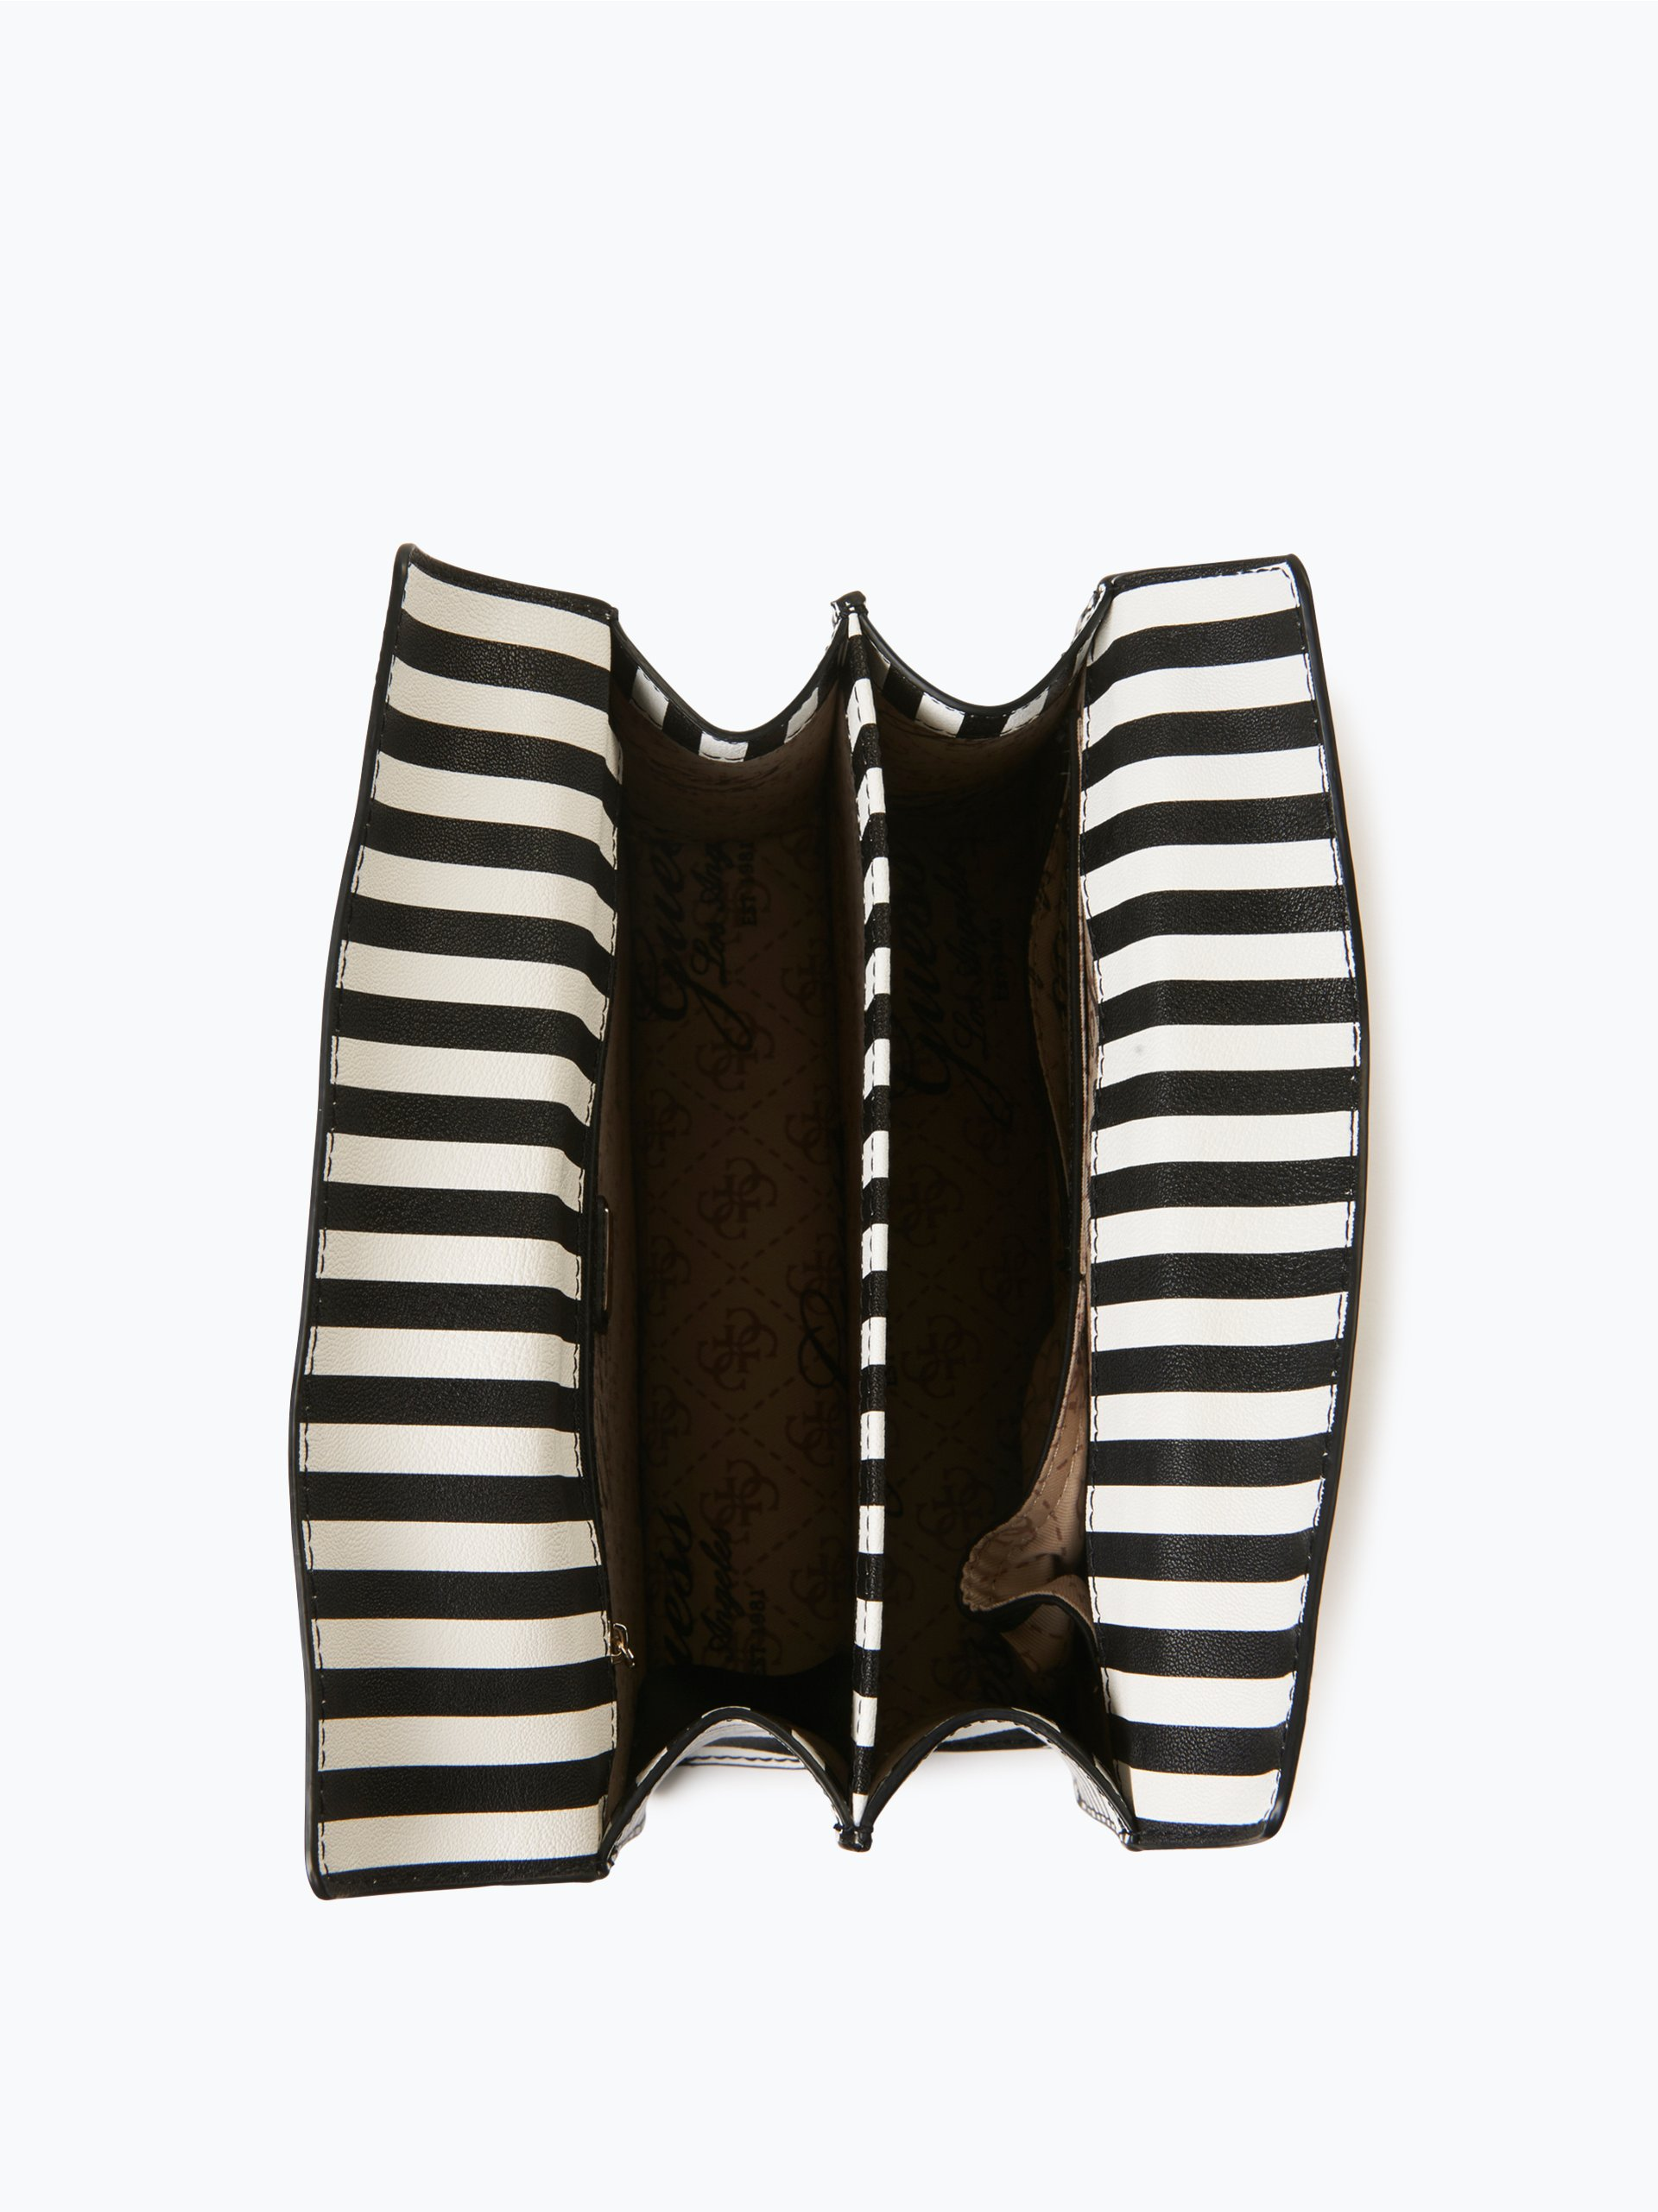 Guess Jeans Damen Handtasche in Leder-Optik - Arianna